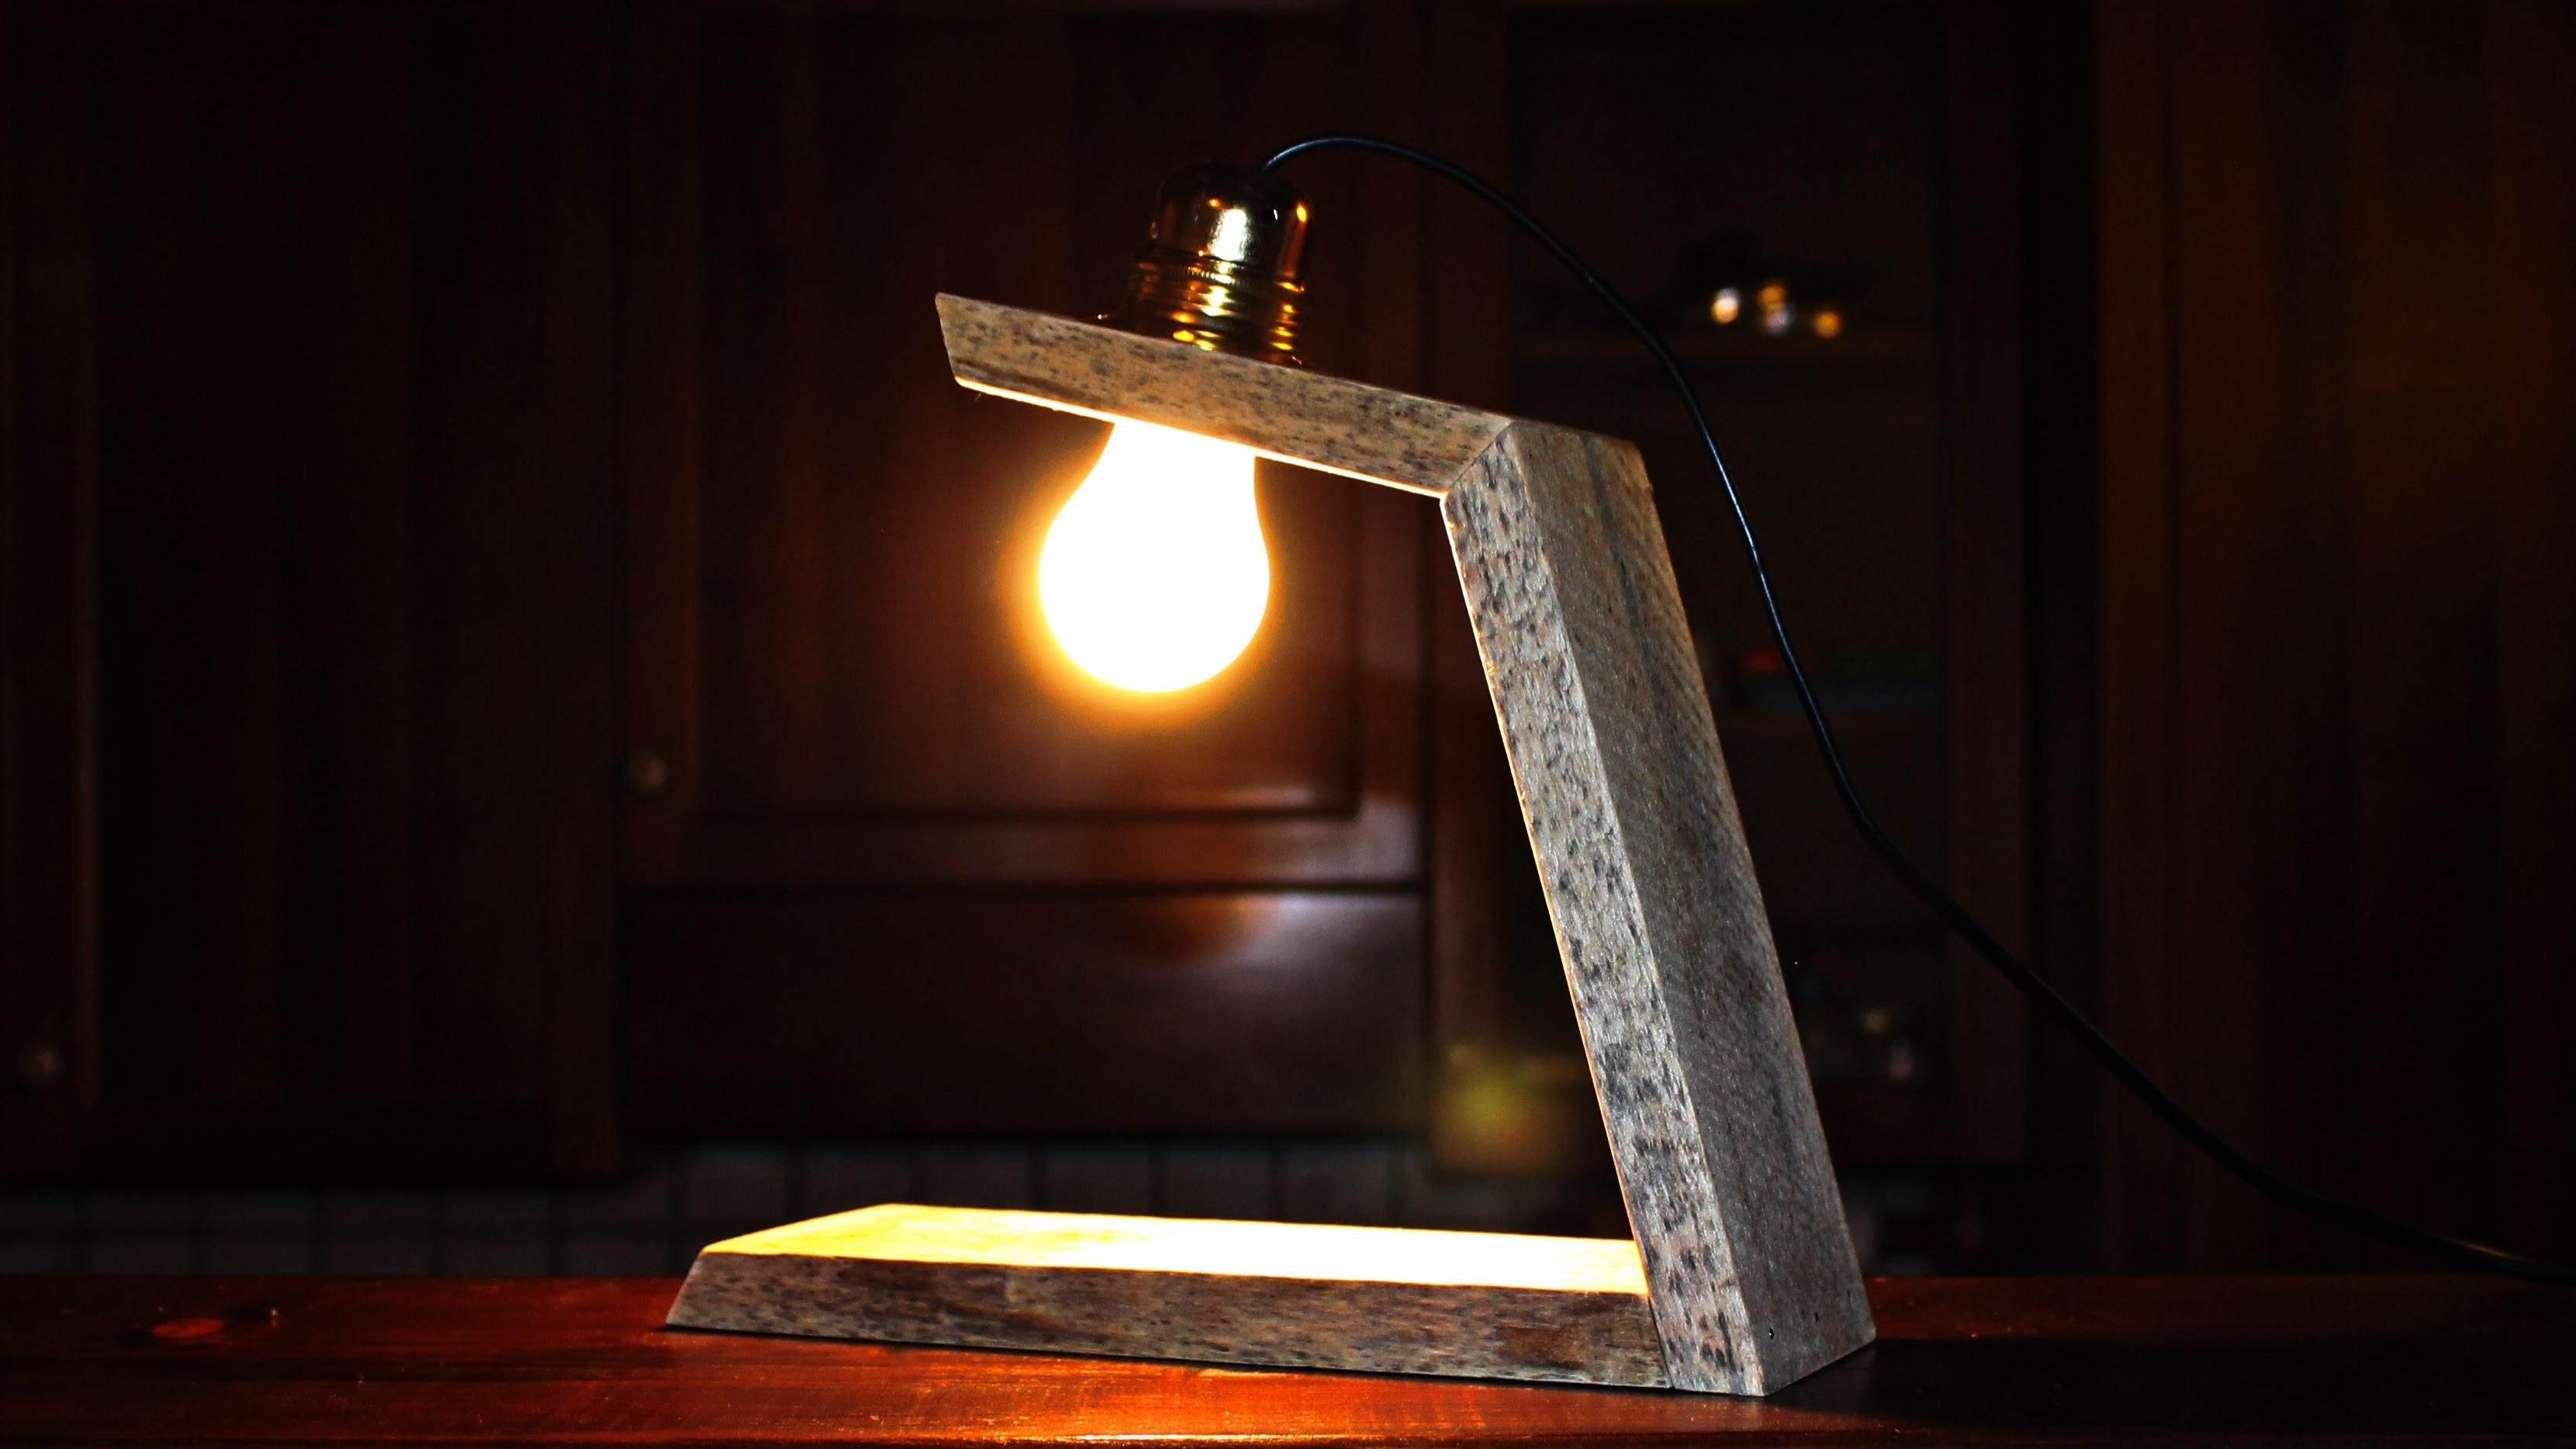 Wooden Lamp - Lampada in legno Fai Da Te DIY